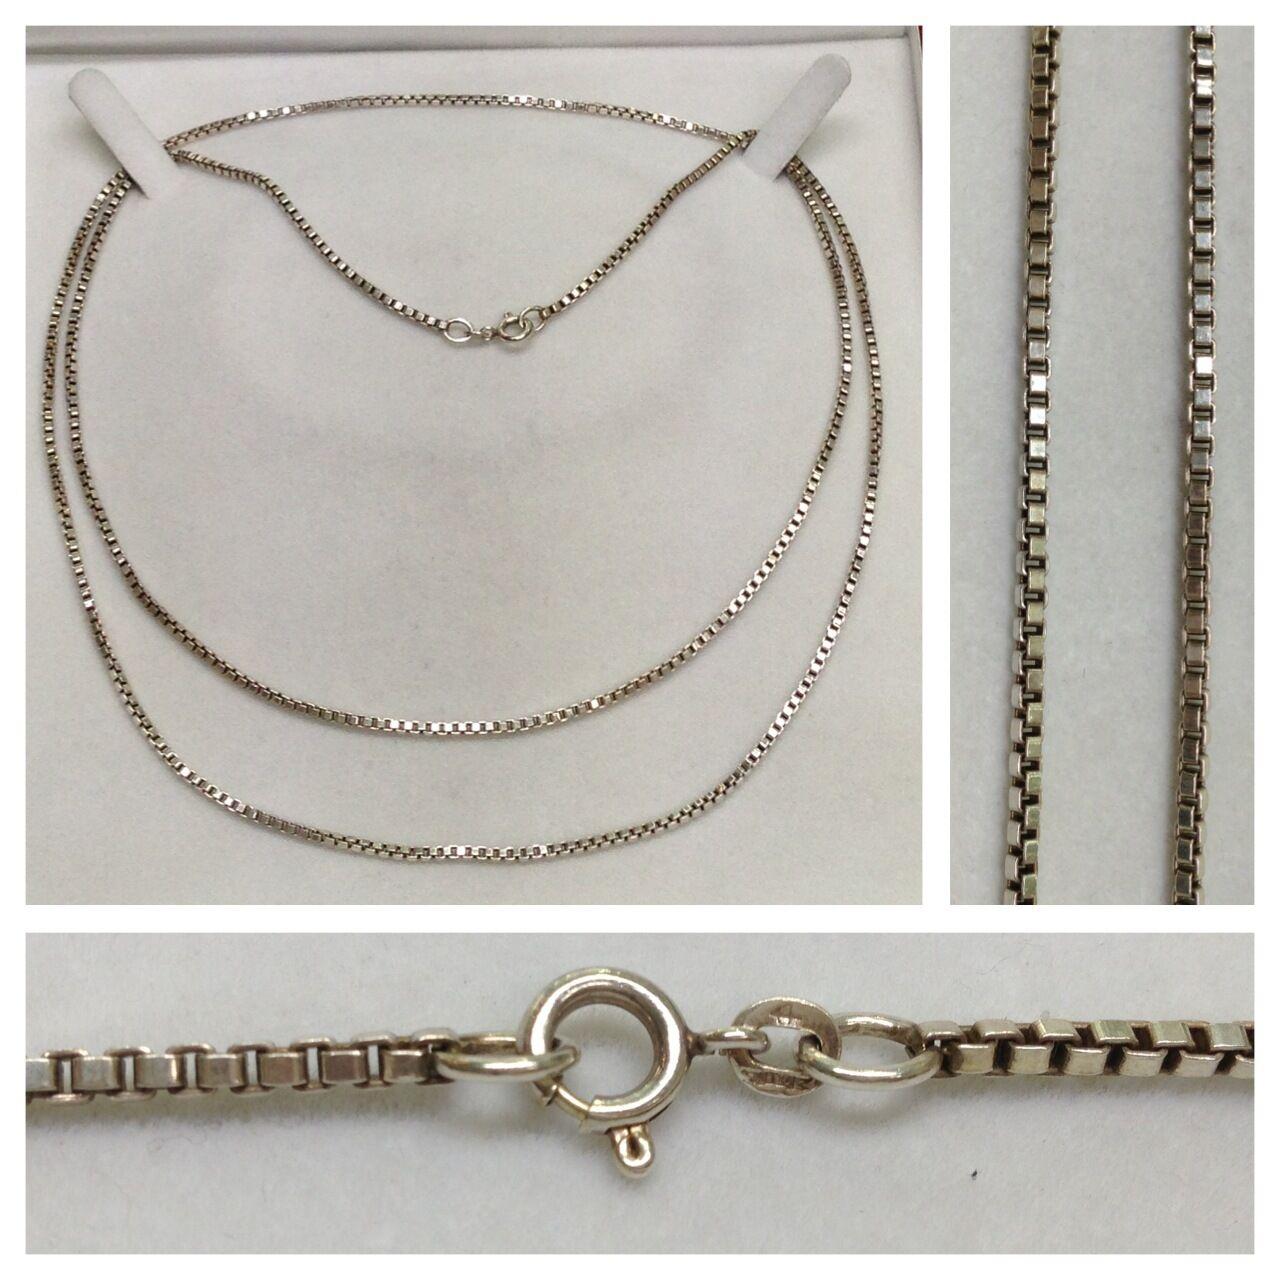 Lange  venezia Kette Veneziakette 835er silver Collier silverkette silvercollier